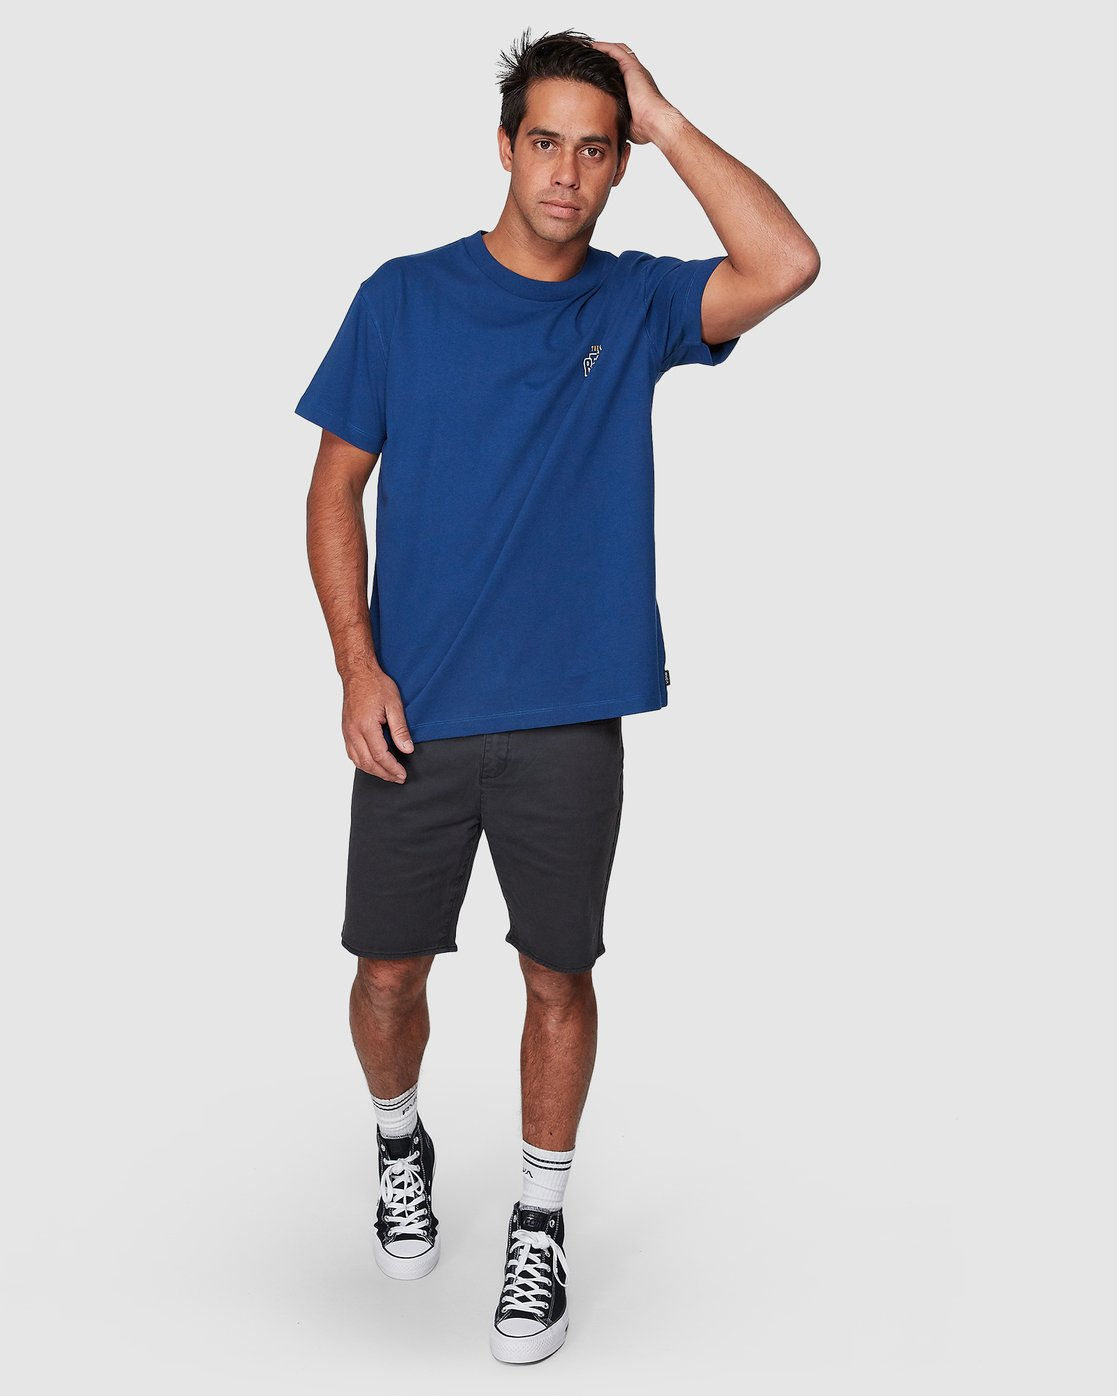 5 Heat Wave Short Sleeve Tee Blue R107047 RVCA